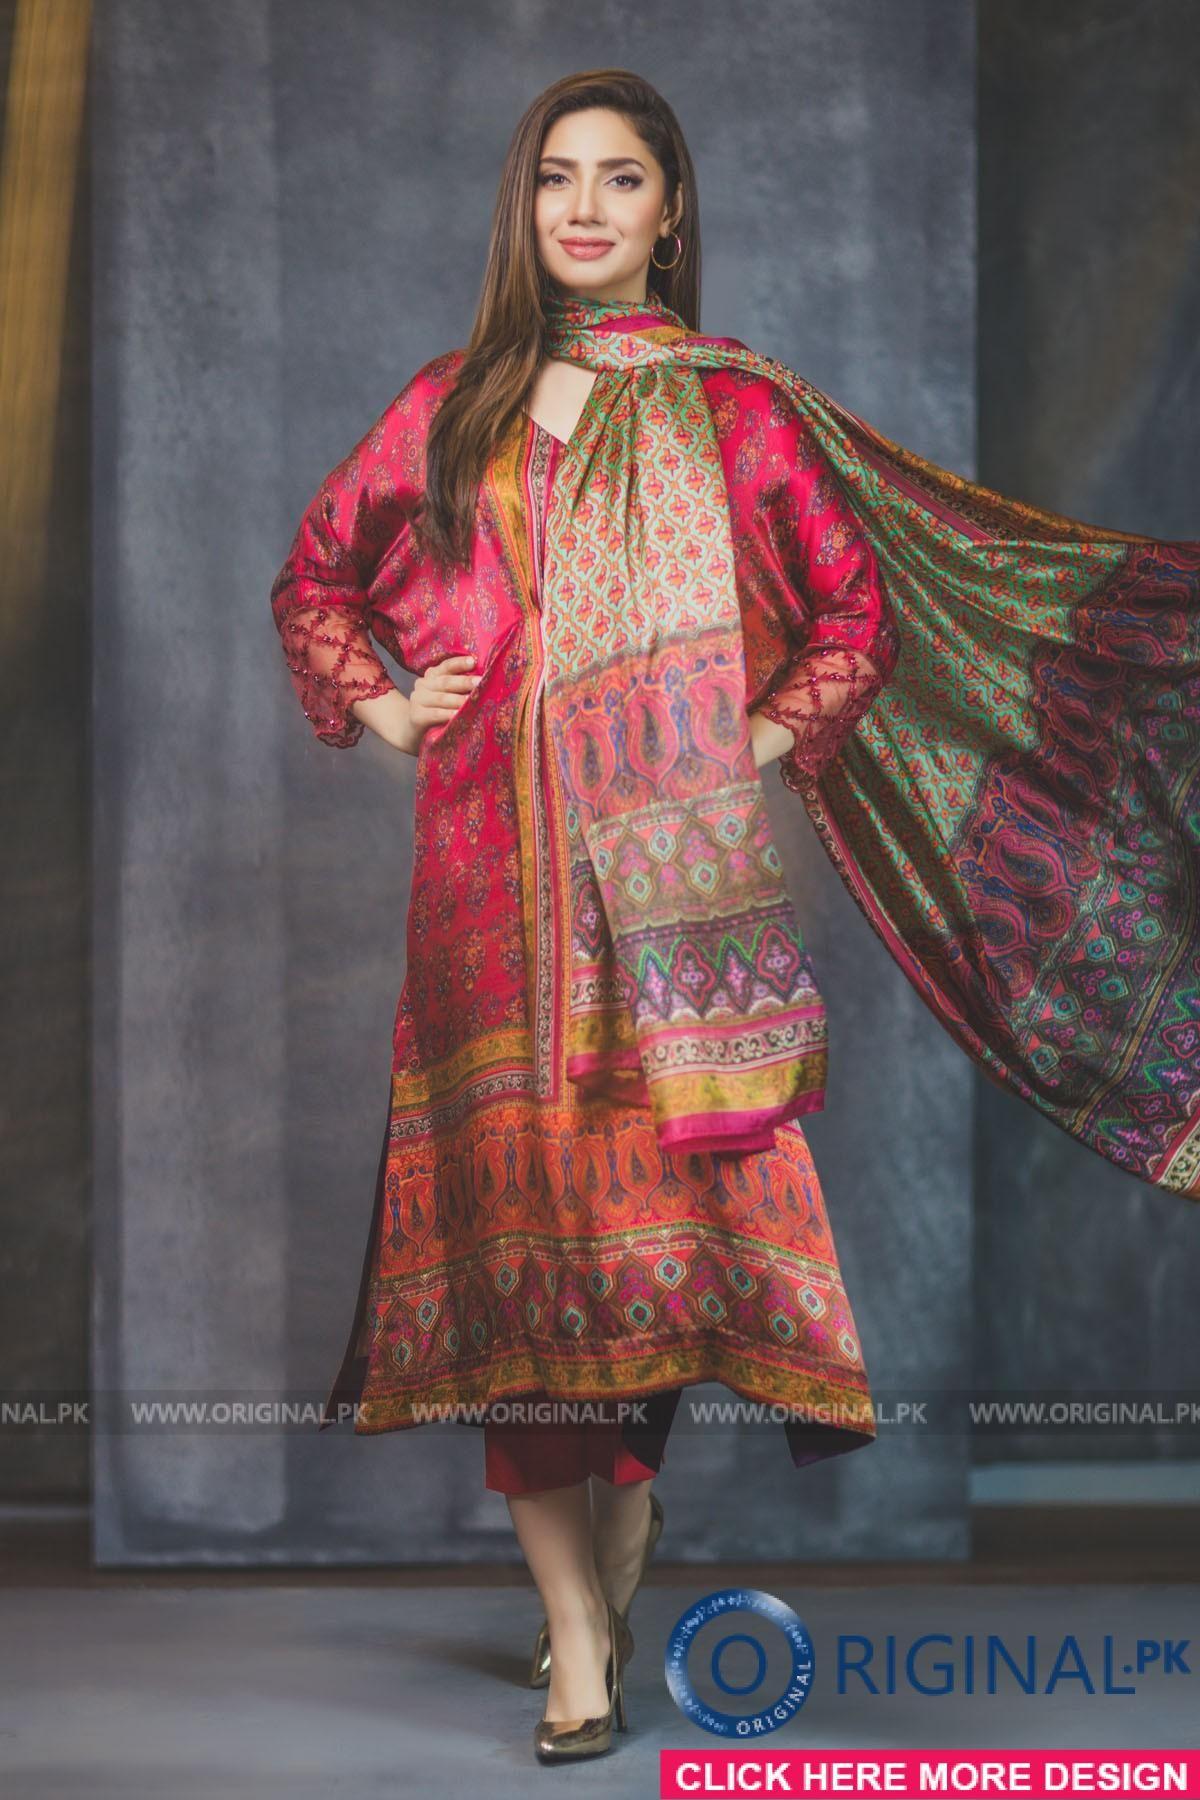 696585e9da Al Karam FC-04-17-DIGITAL PRINT Sephora, Pakistan. Model Mahira Khan ...